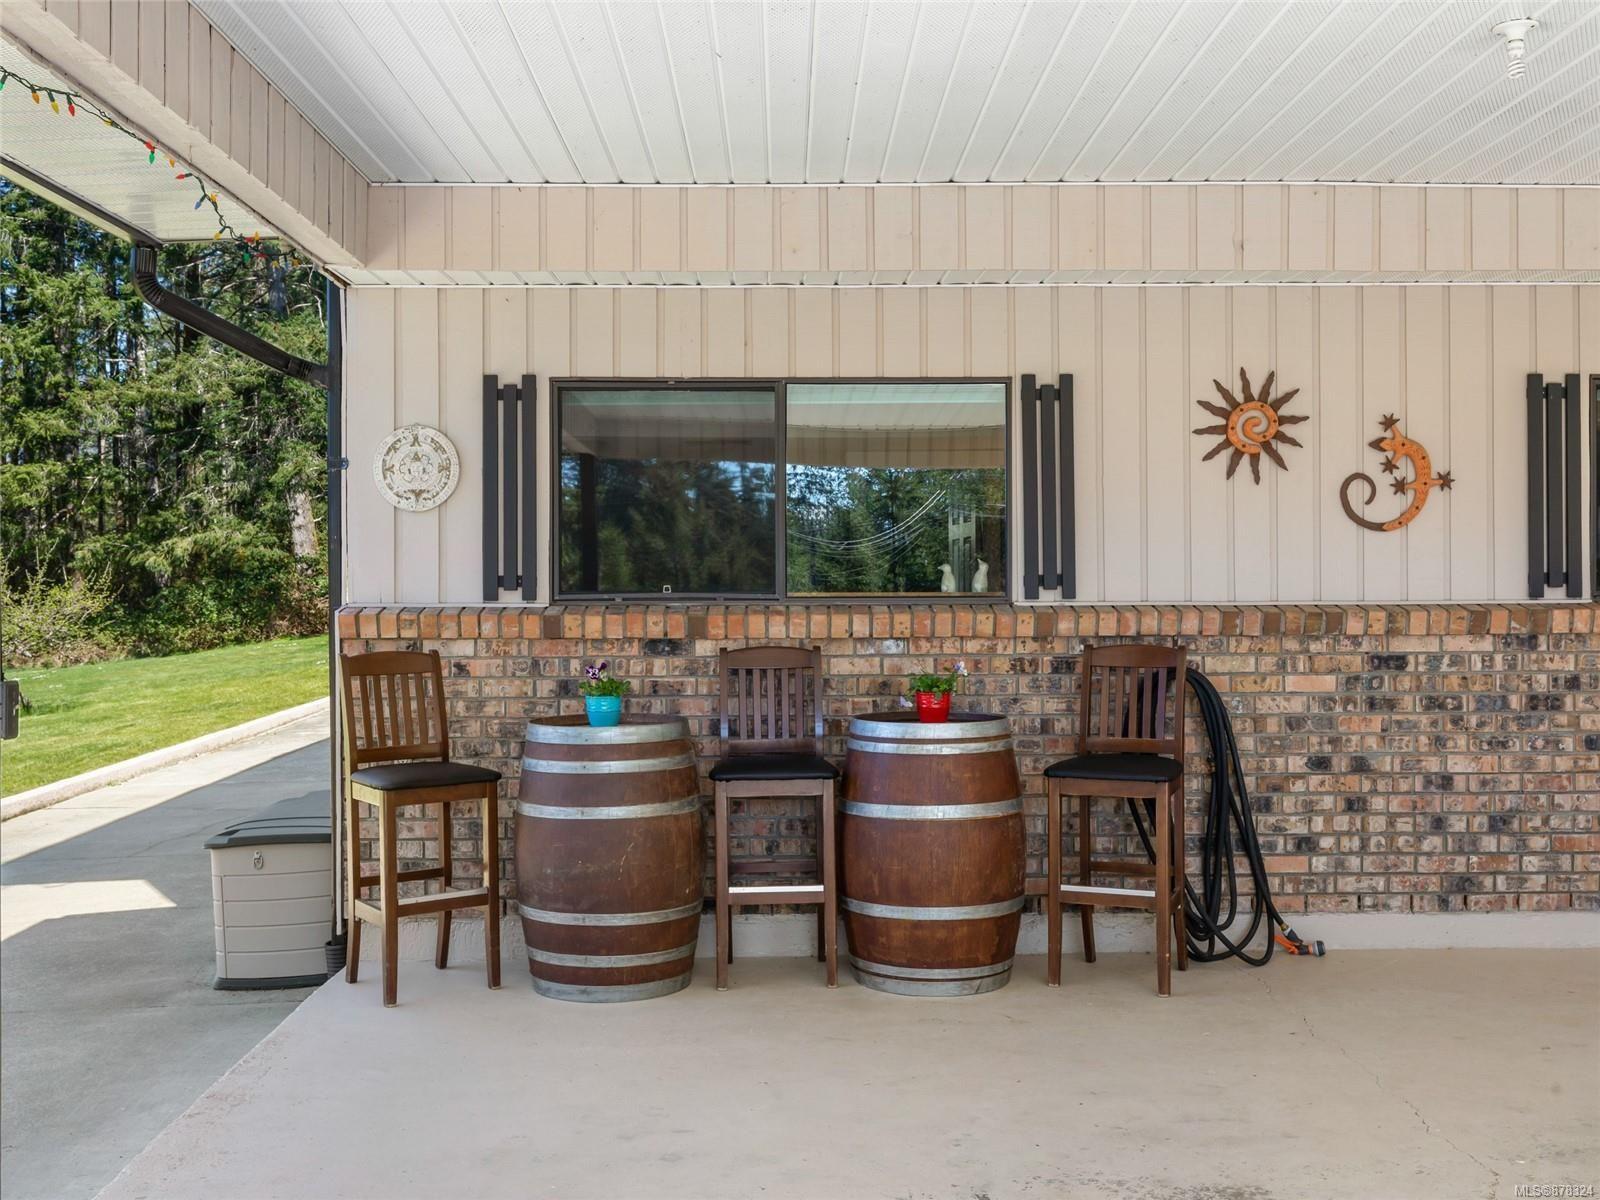 Photo 42: Photos: 3875 Moore Rd in : PA Port Alberni House for sale (Port Alberni)  : MLS®# 878324